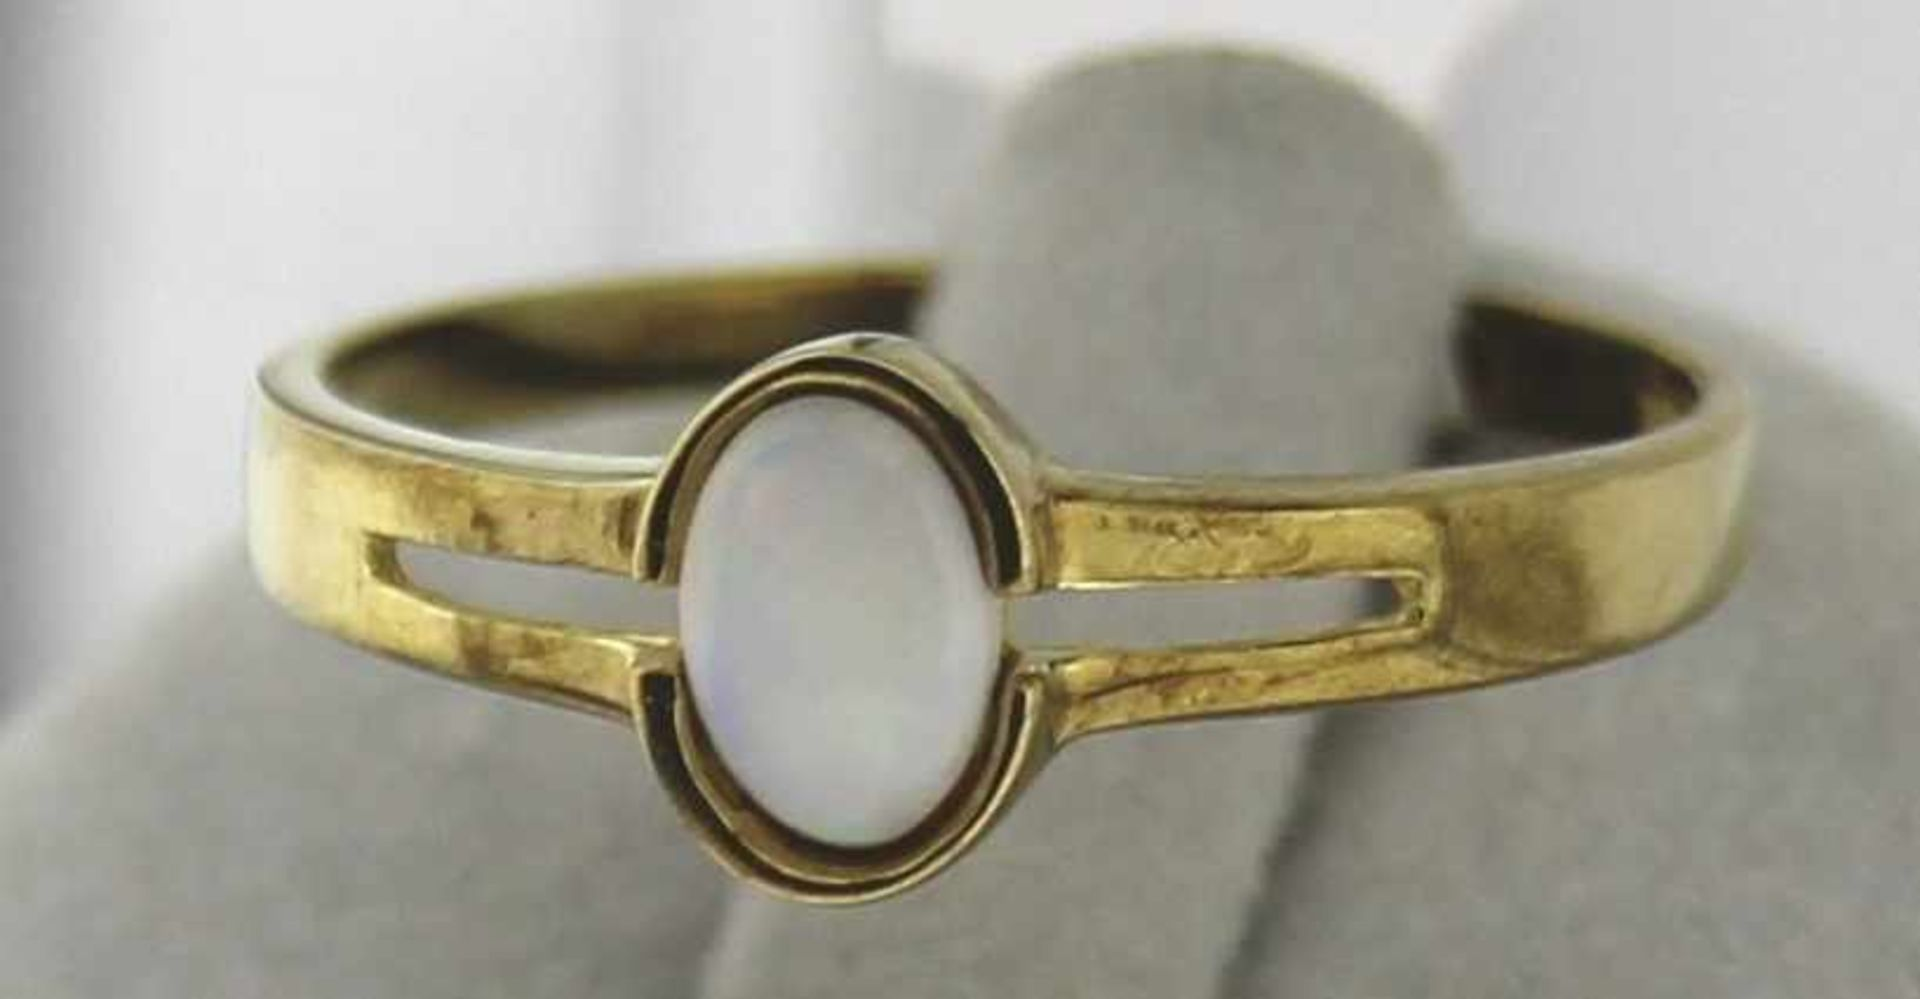 Damenring mit Opal 333 Gold, NOS Gr. 59, Gesamtgewicht ca. 1,5 Gramm, weißer Opal ca. 6 X 4mm, NOS